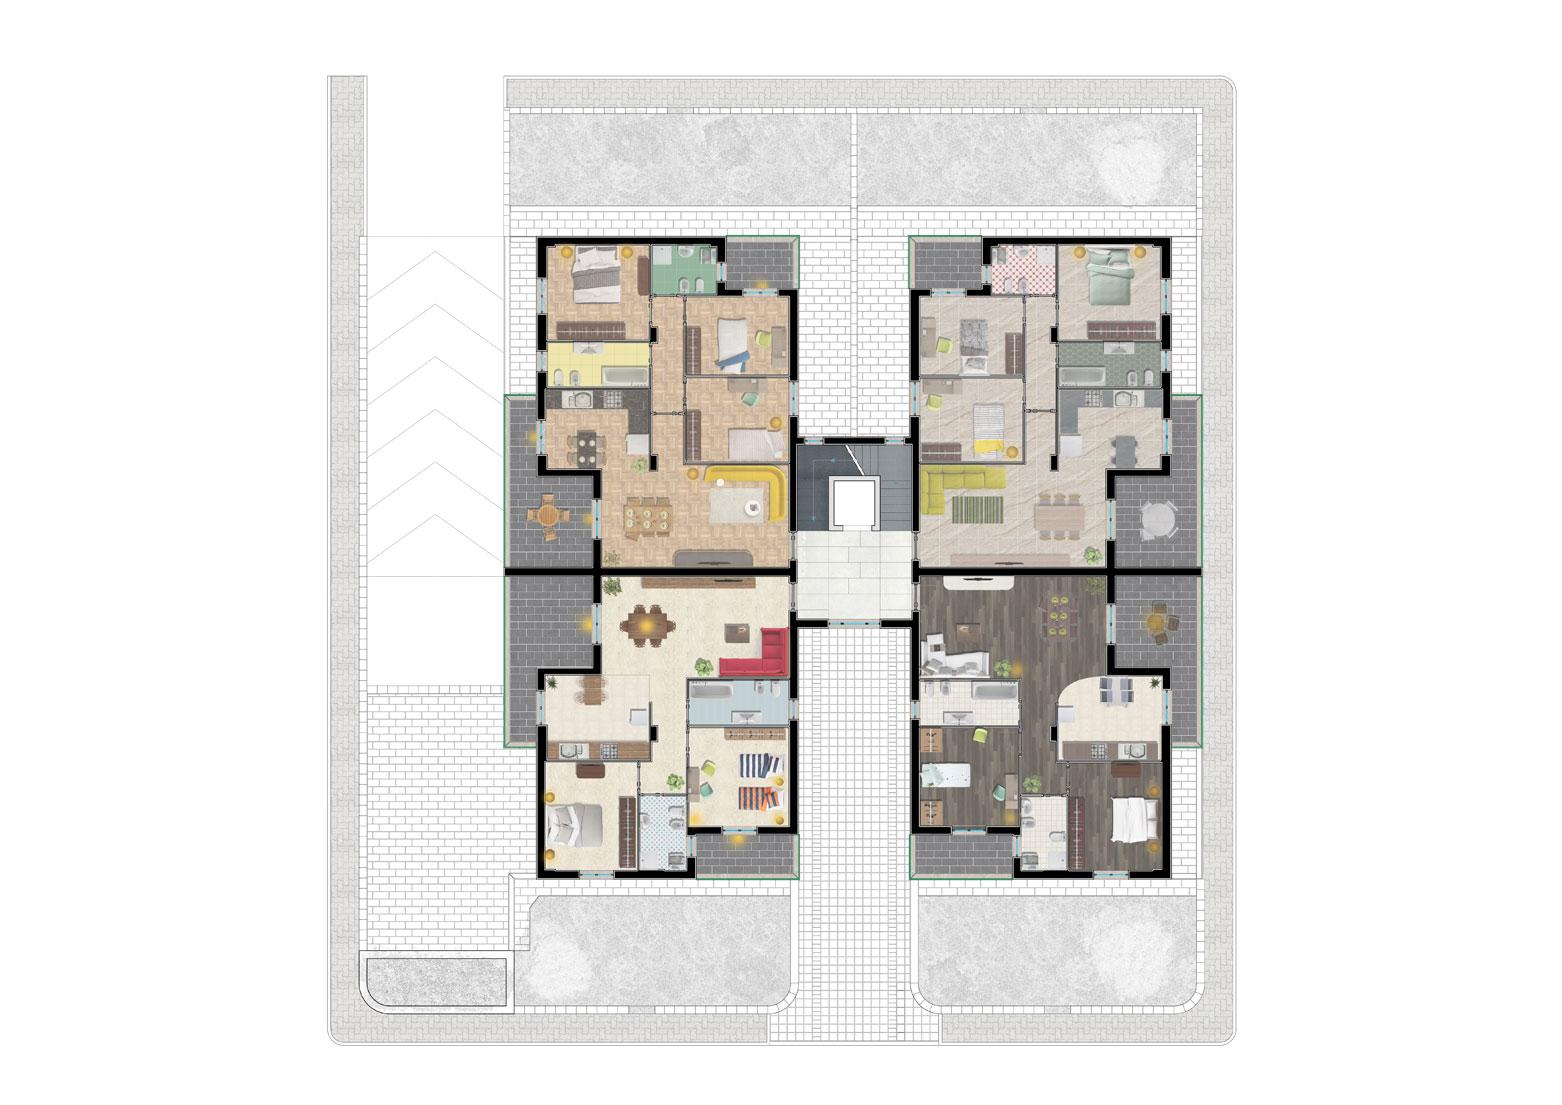 Pianta del Piano Secondo Edificio D